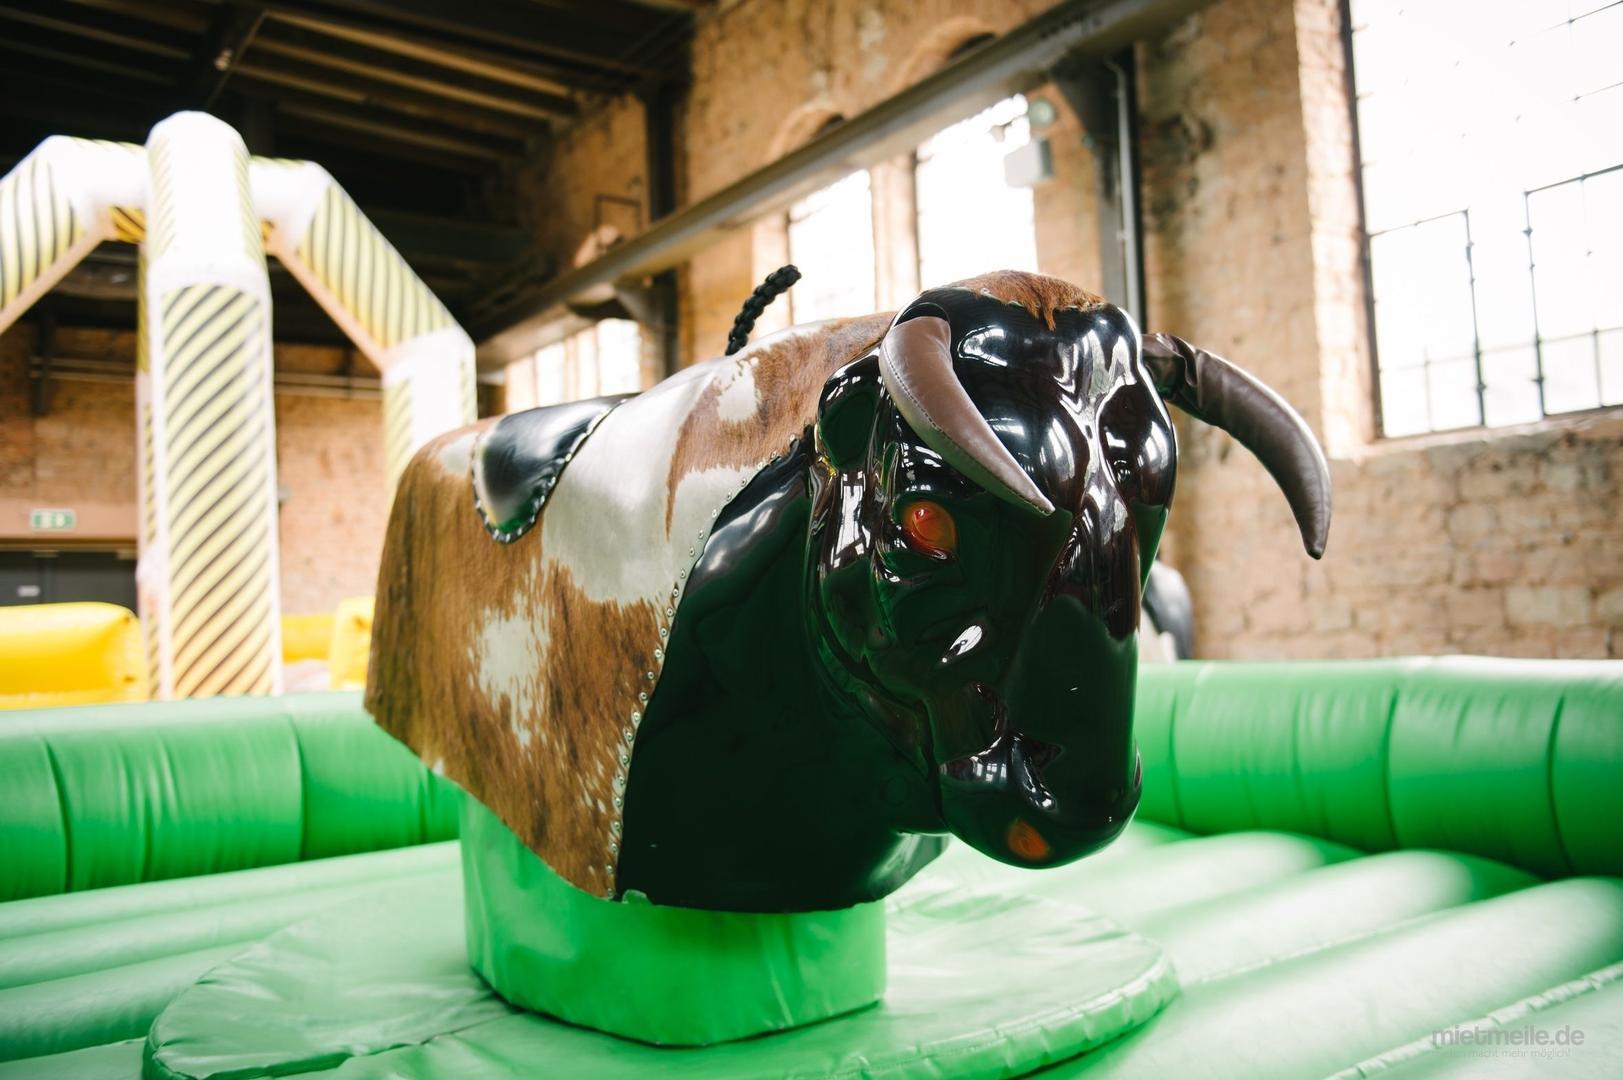 Bullriding mieten & vermieten - Bull Riding, Rodeo Reiten, Surfing Simulator, Flaschen Reiten, Rentier Reiten in Sankt Ingbert